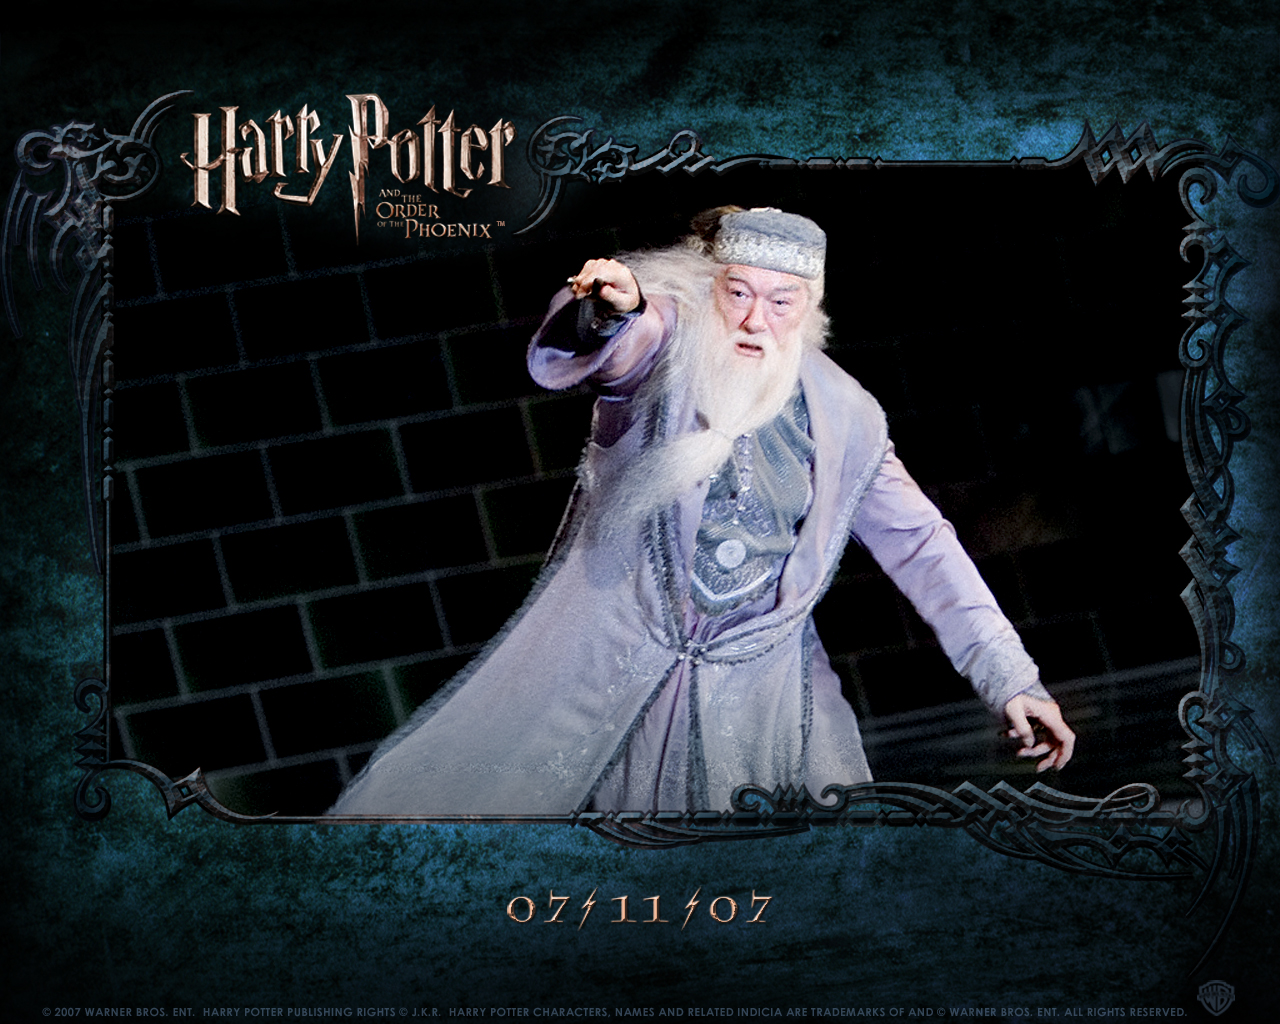 Download Harry Potter Movie Wallpaper 404 Creative Studios